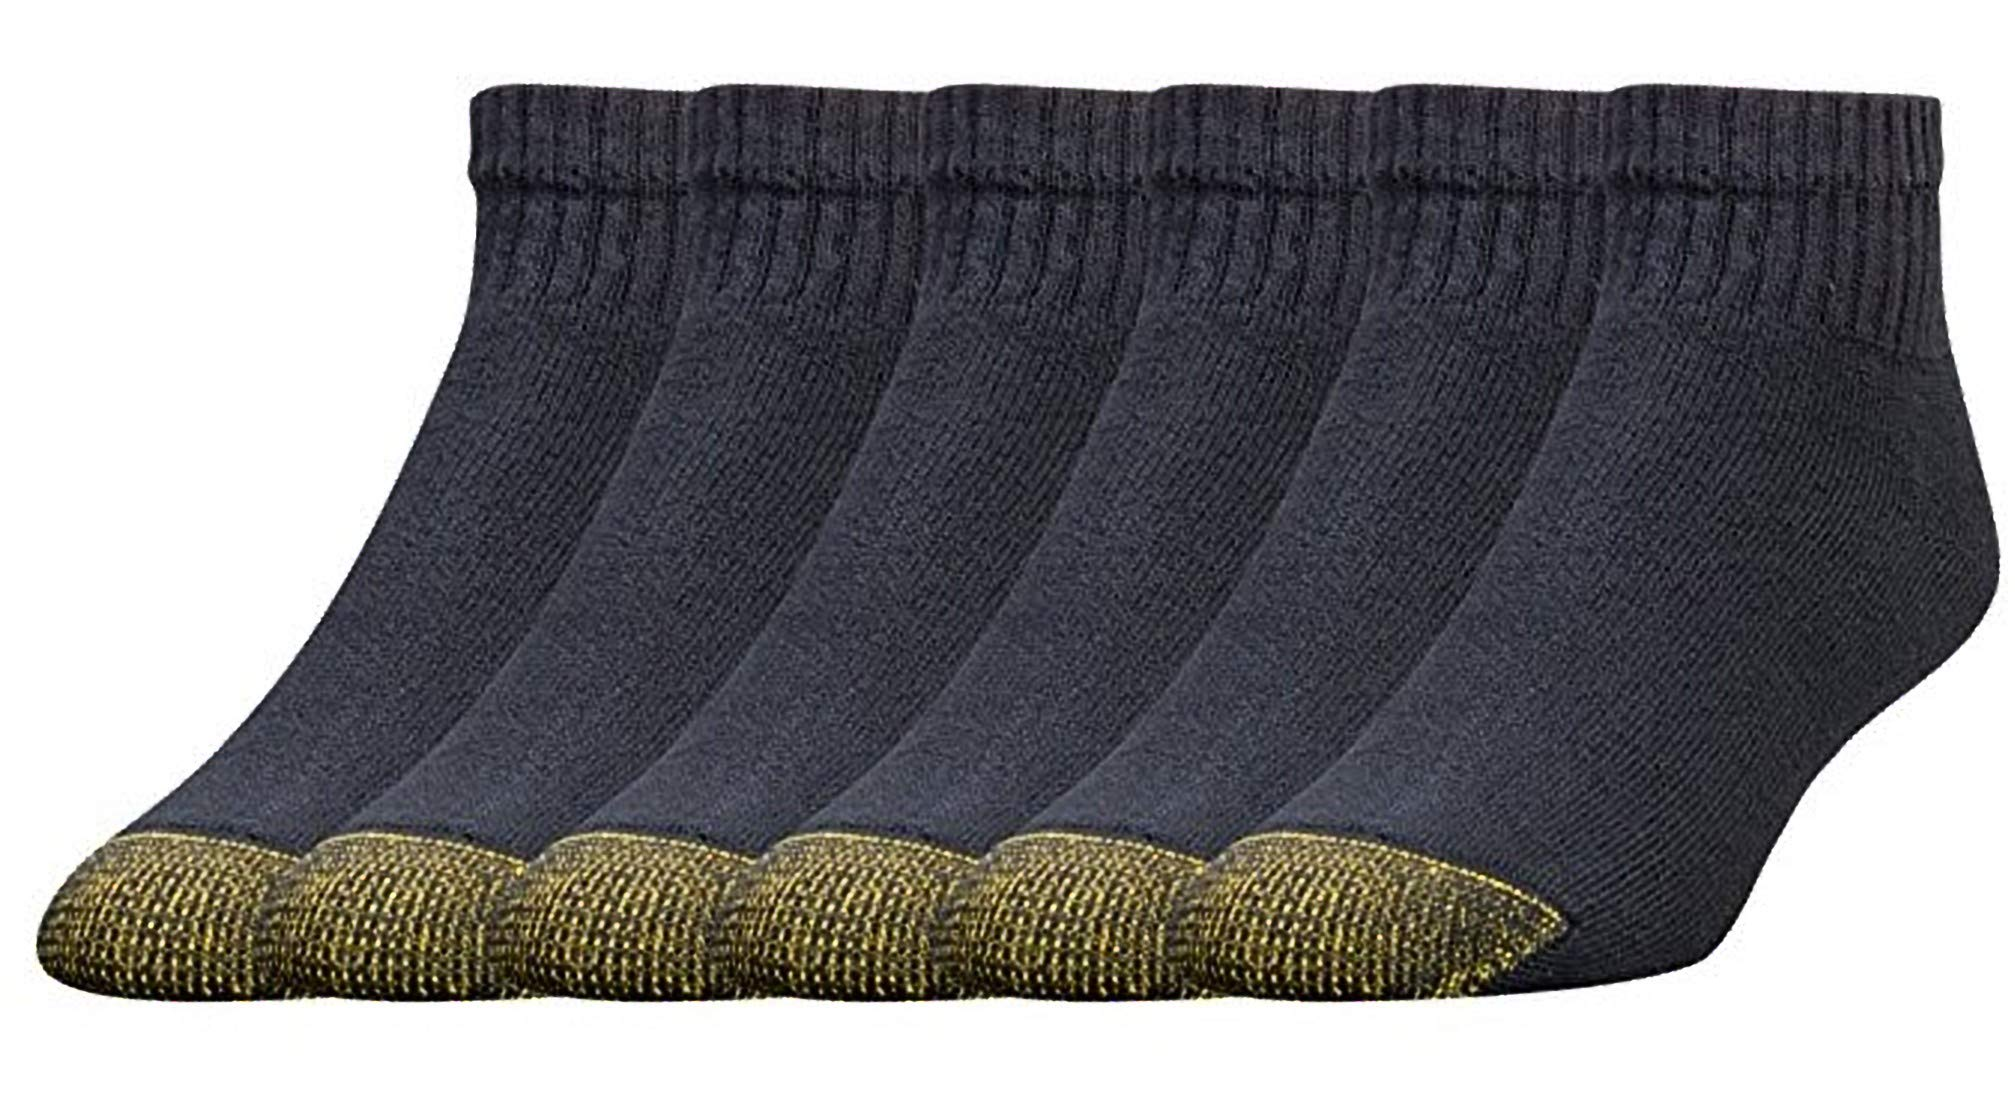 Gold Toe Men's 656P Cotton Quarter Athletic Sock (12 Pack), Black, Small 6-12